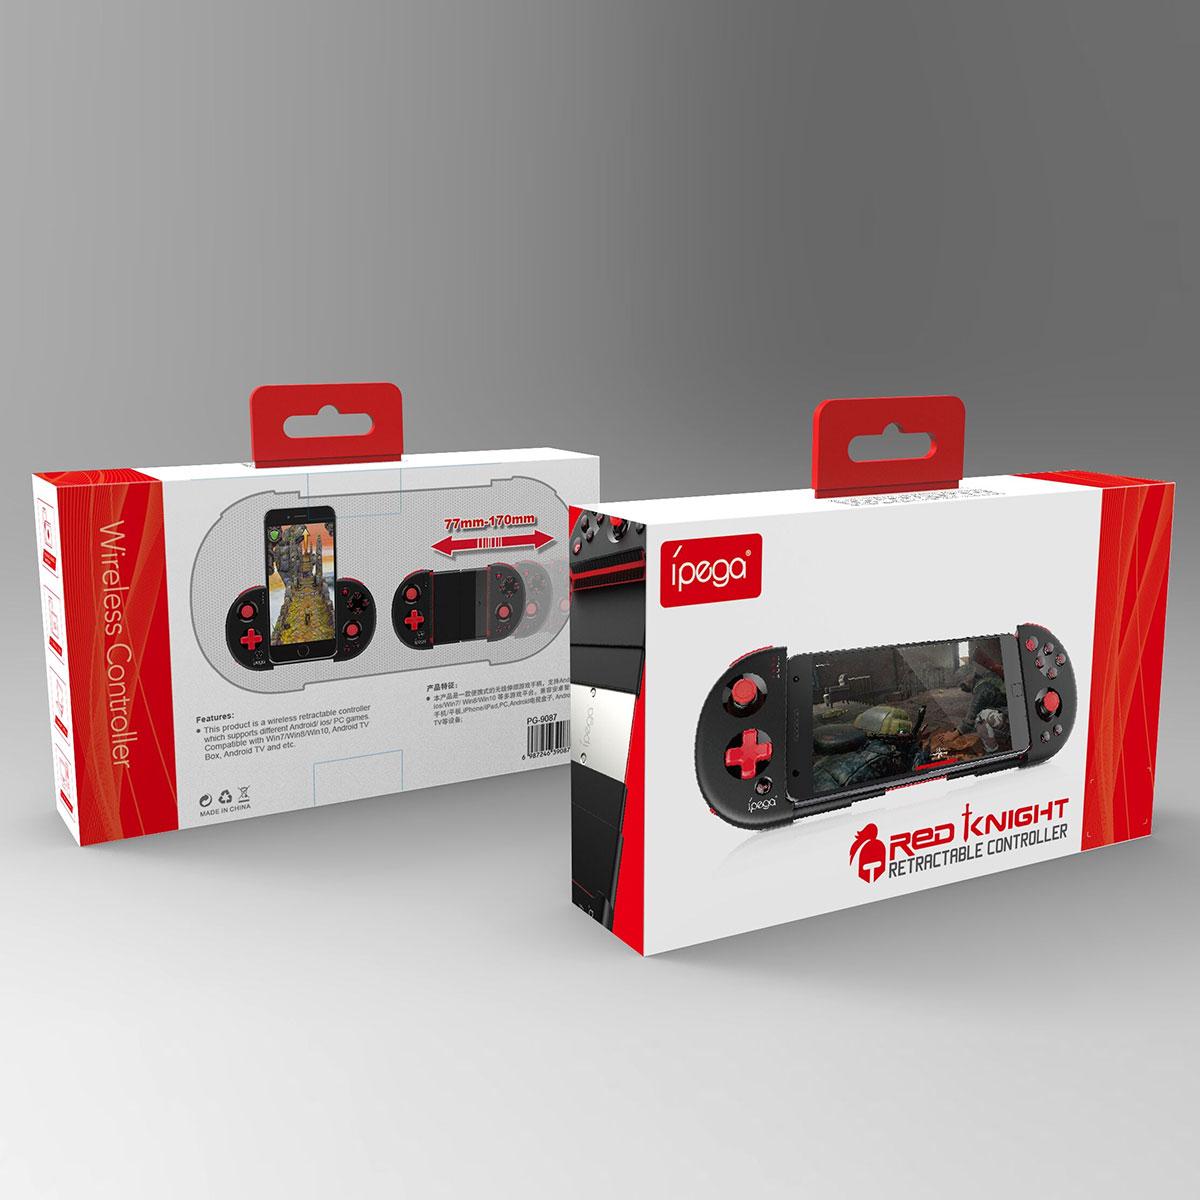 Ipega 9087 Red Knight Telescopic Bluetooth Controller-Game